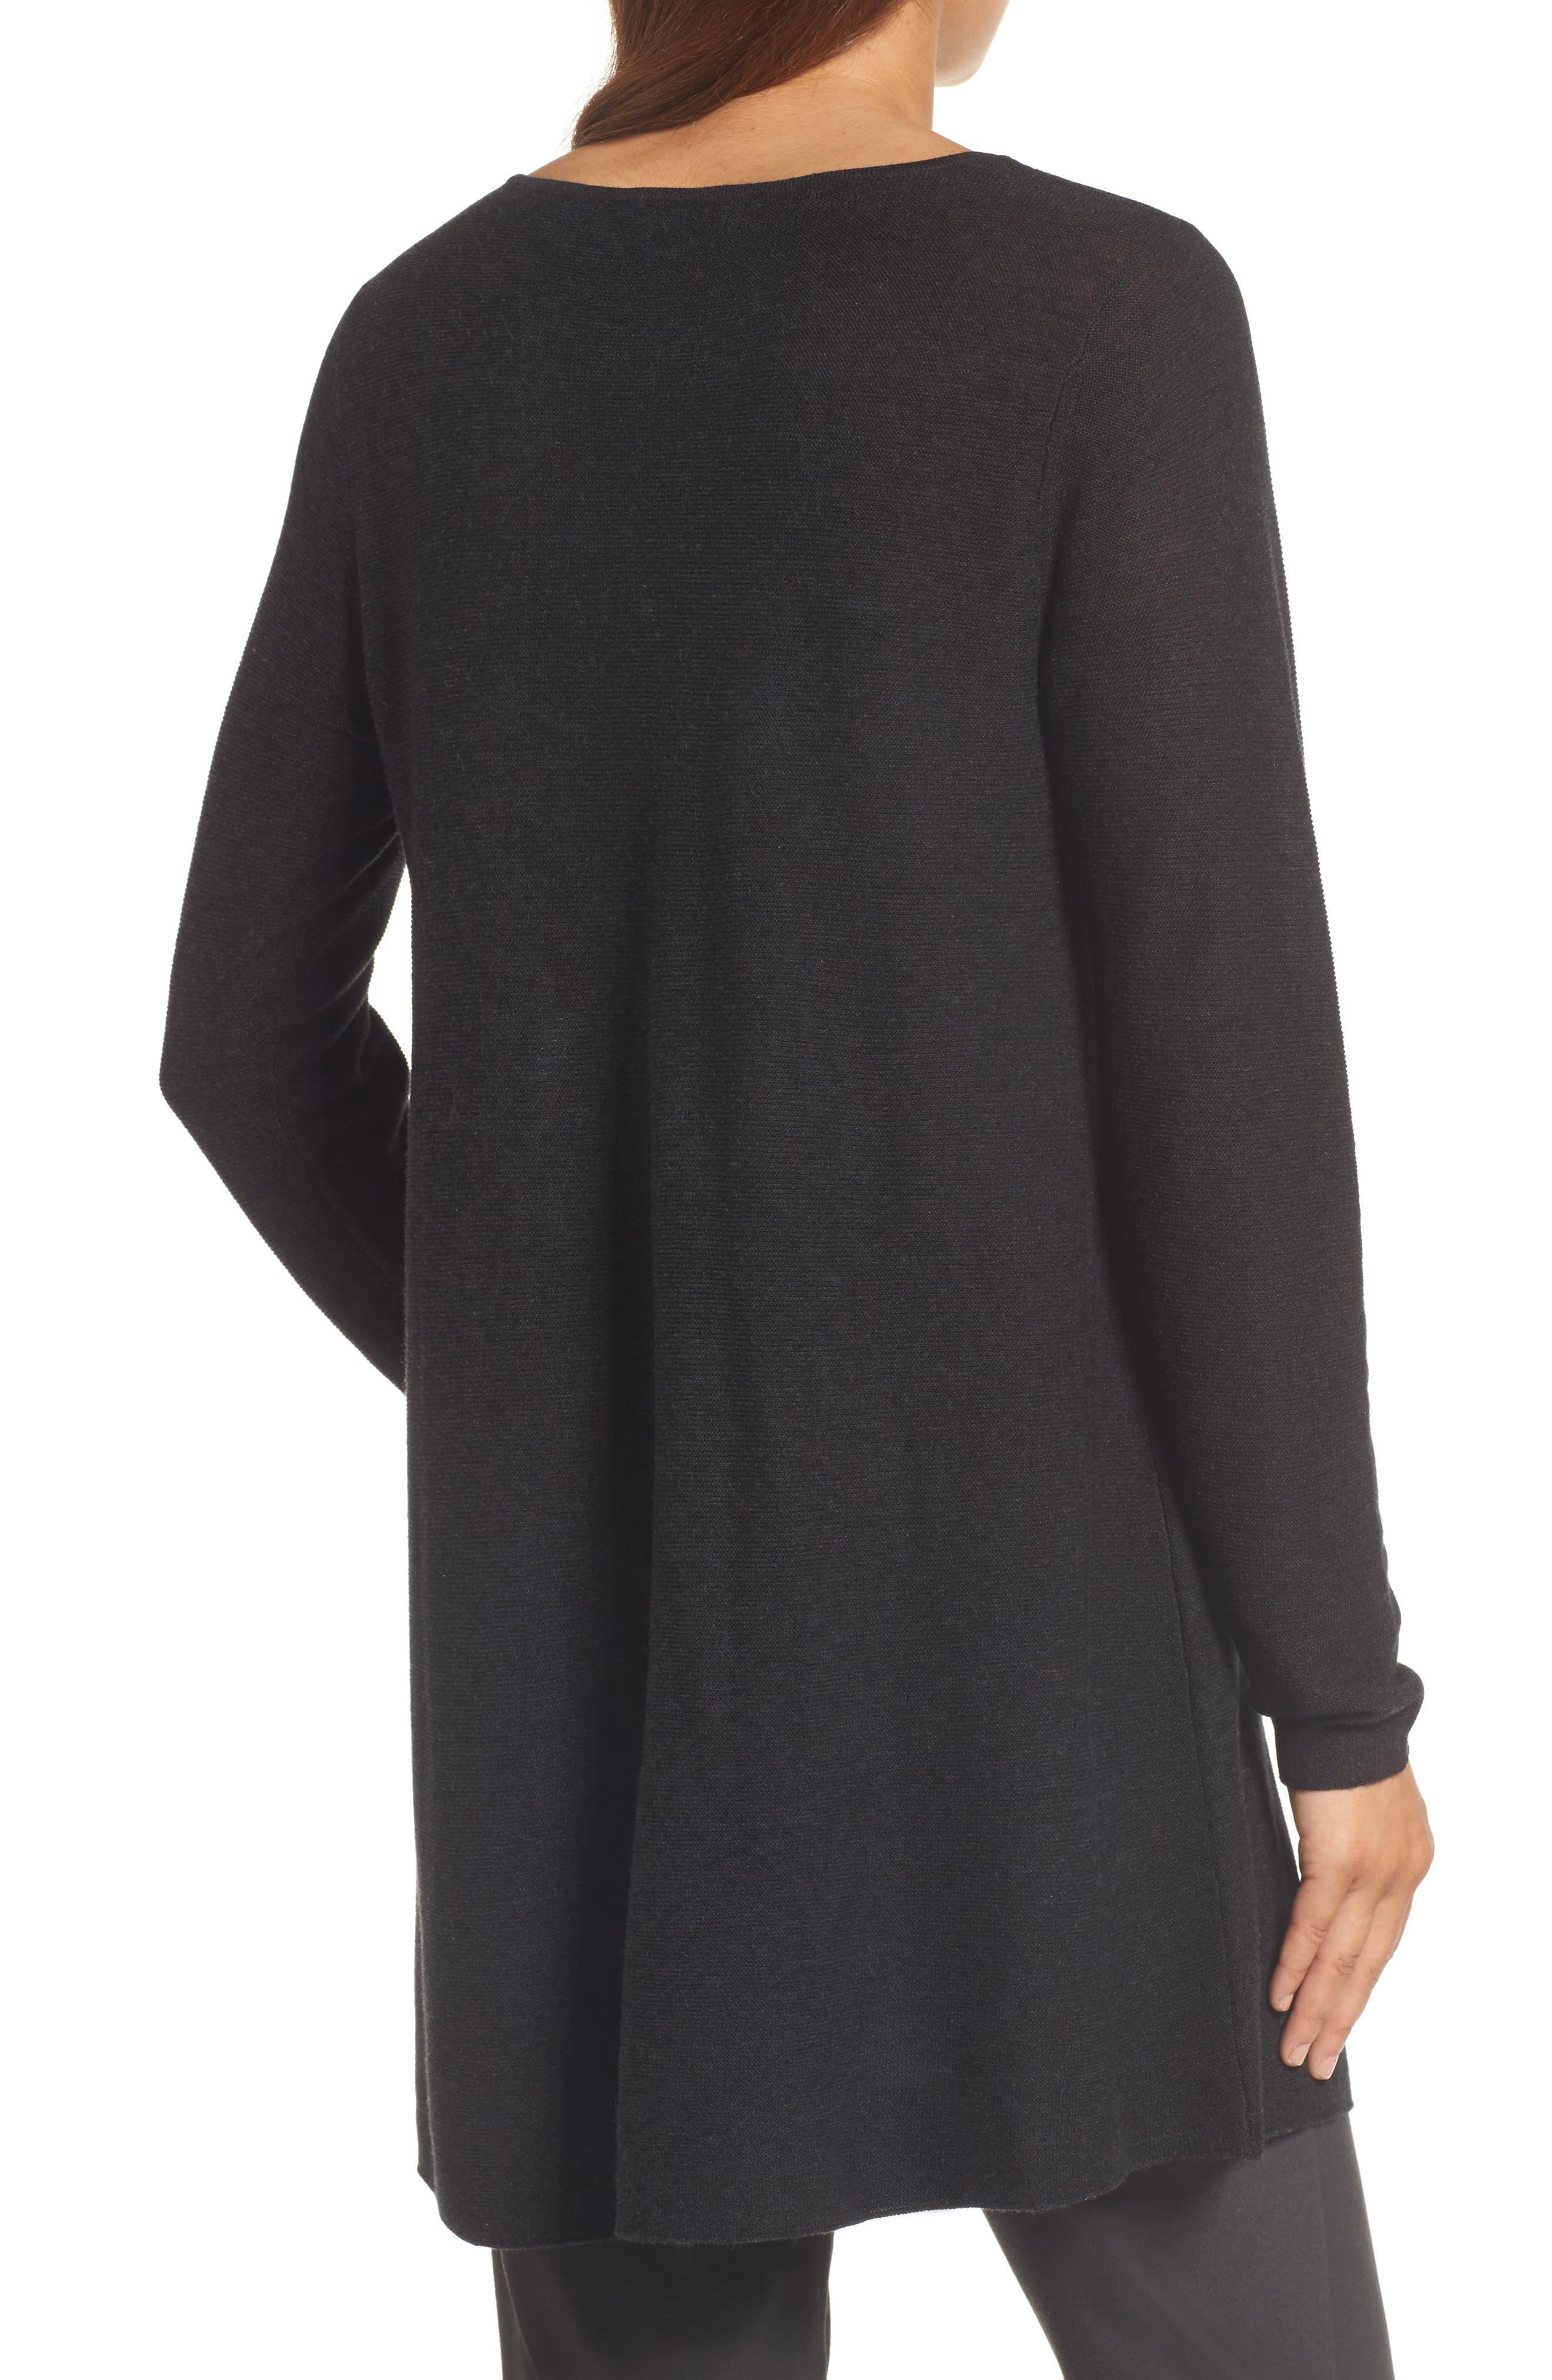 Jewel Neck Tunic Sweater,                             Alternate thumbnail 2, color,                             021